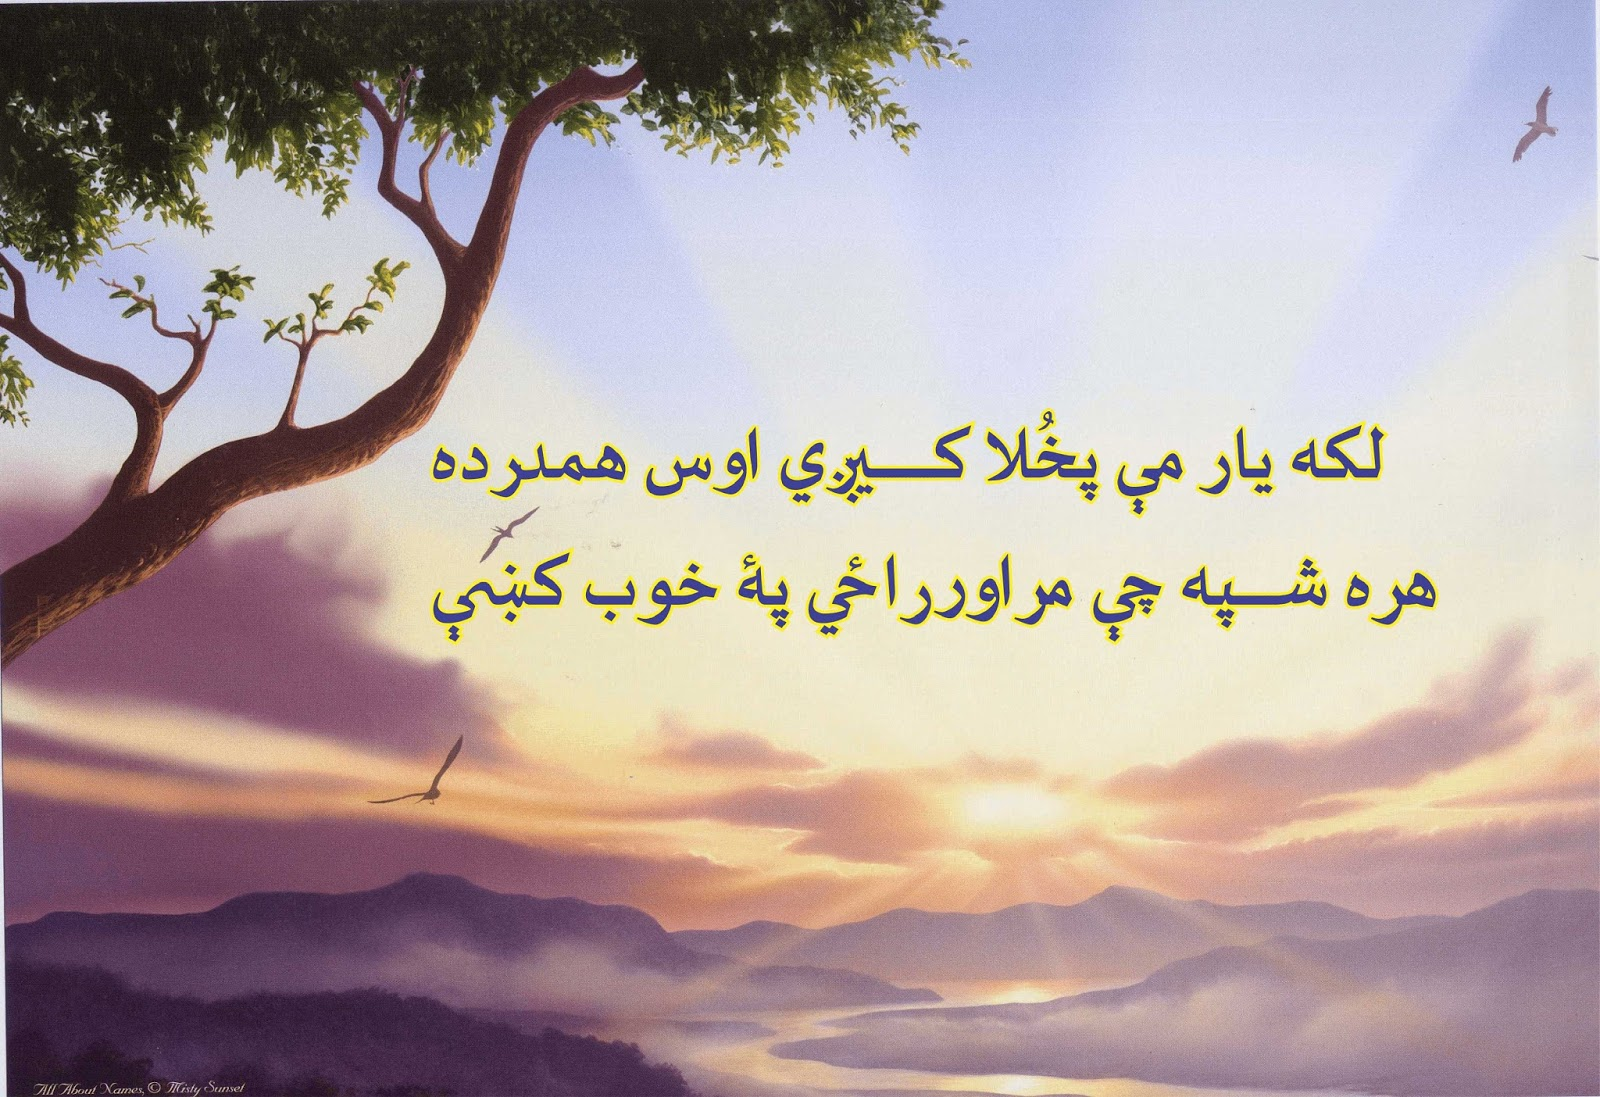 abdul rahman baba poetry in pashto   urdu cartoon jokes